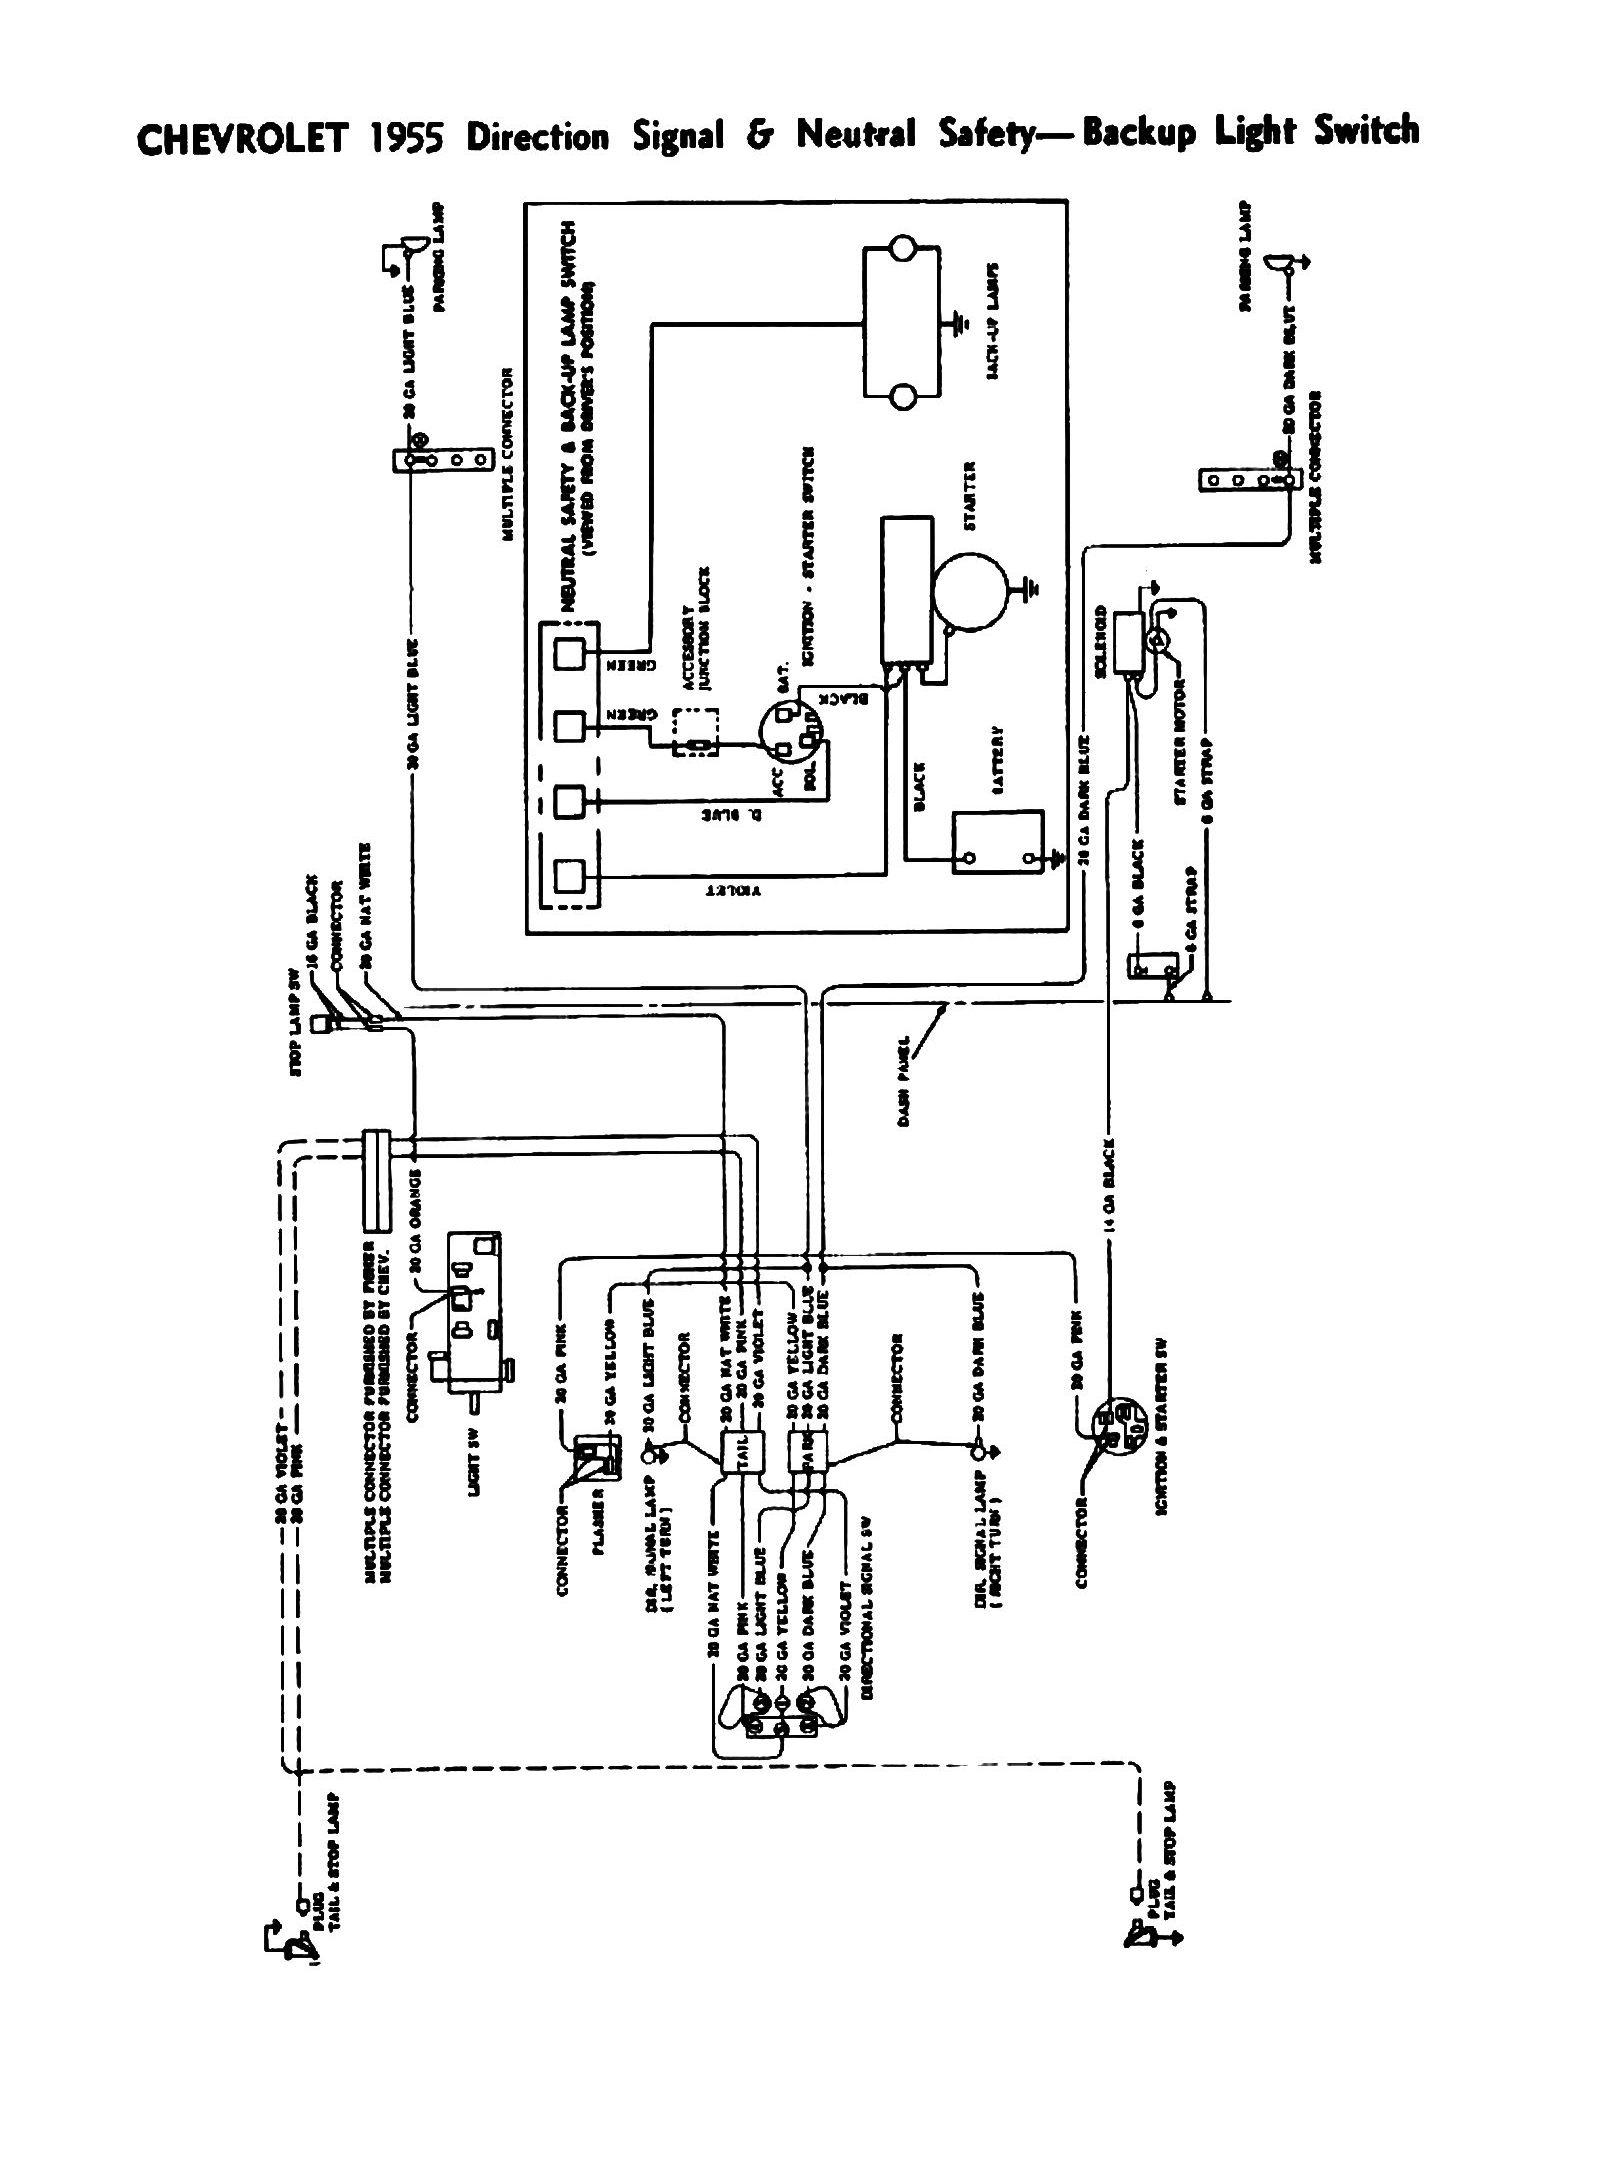 Chevy Turn Signal Switch Wiring Diagram